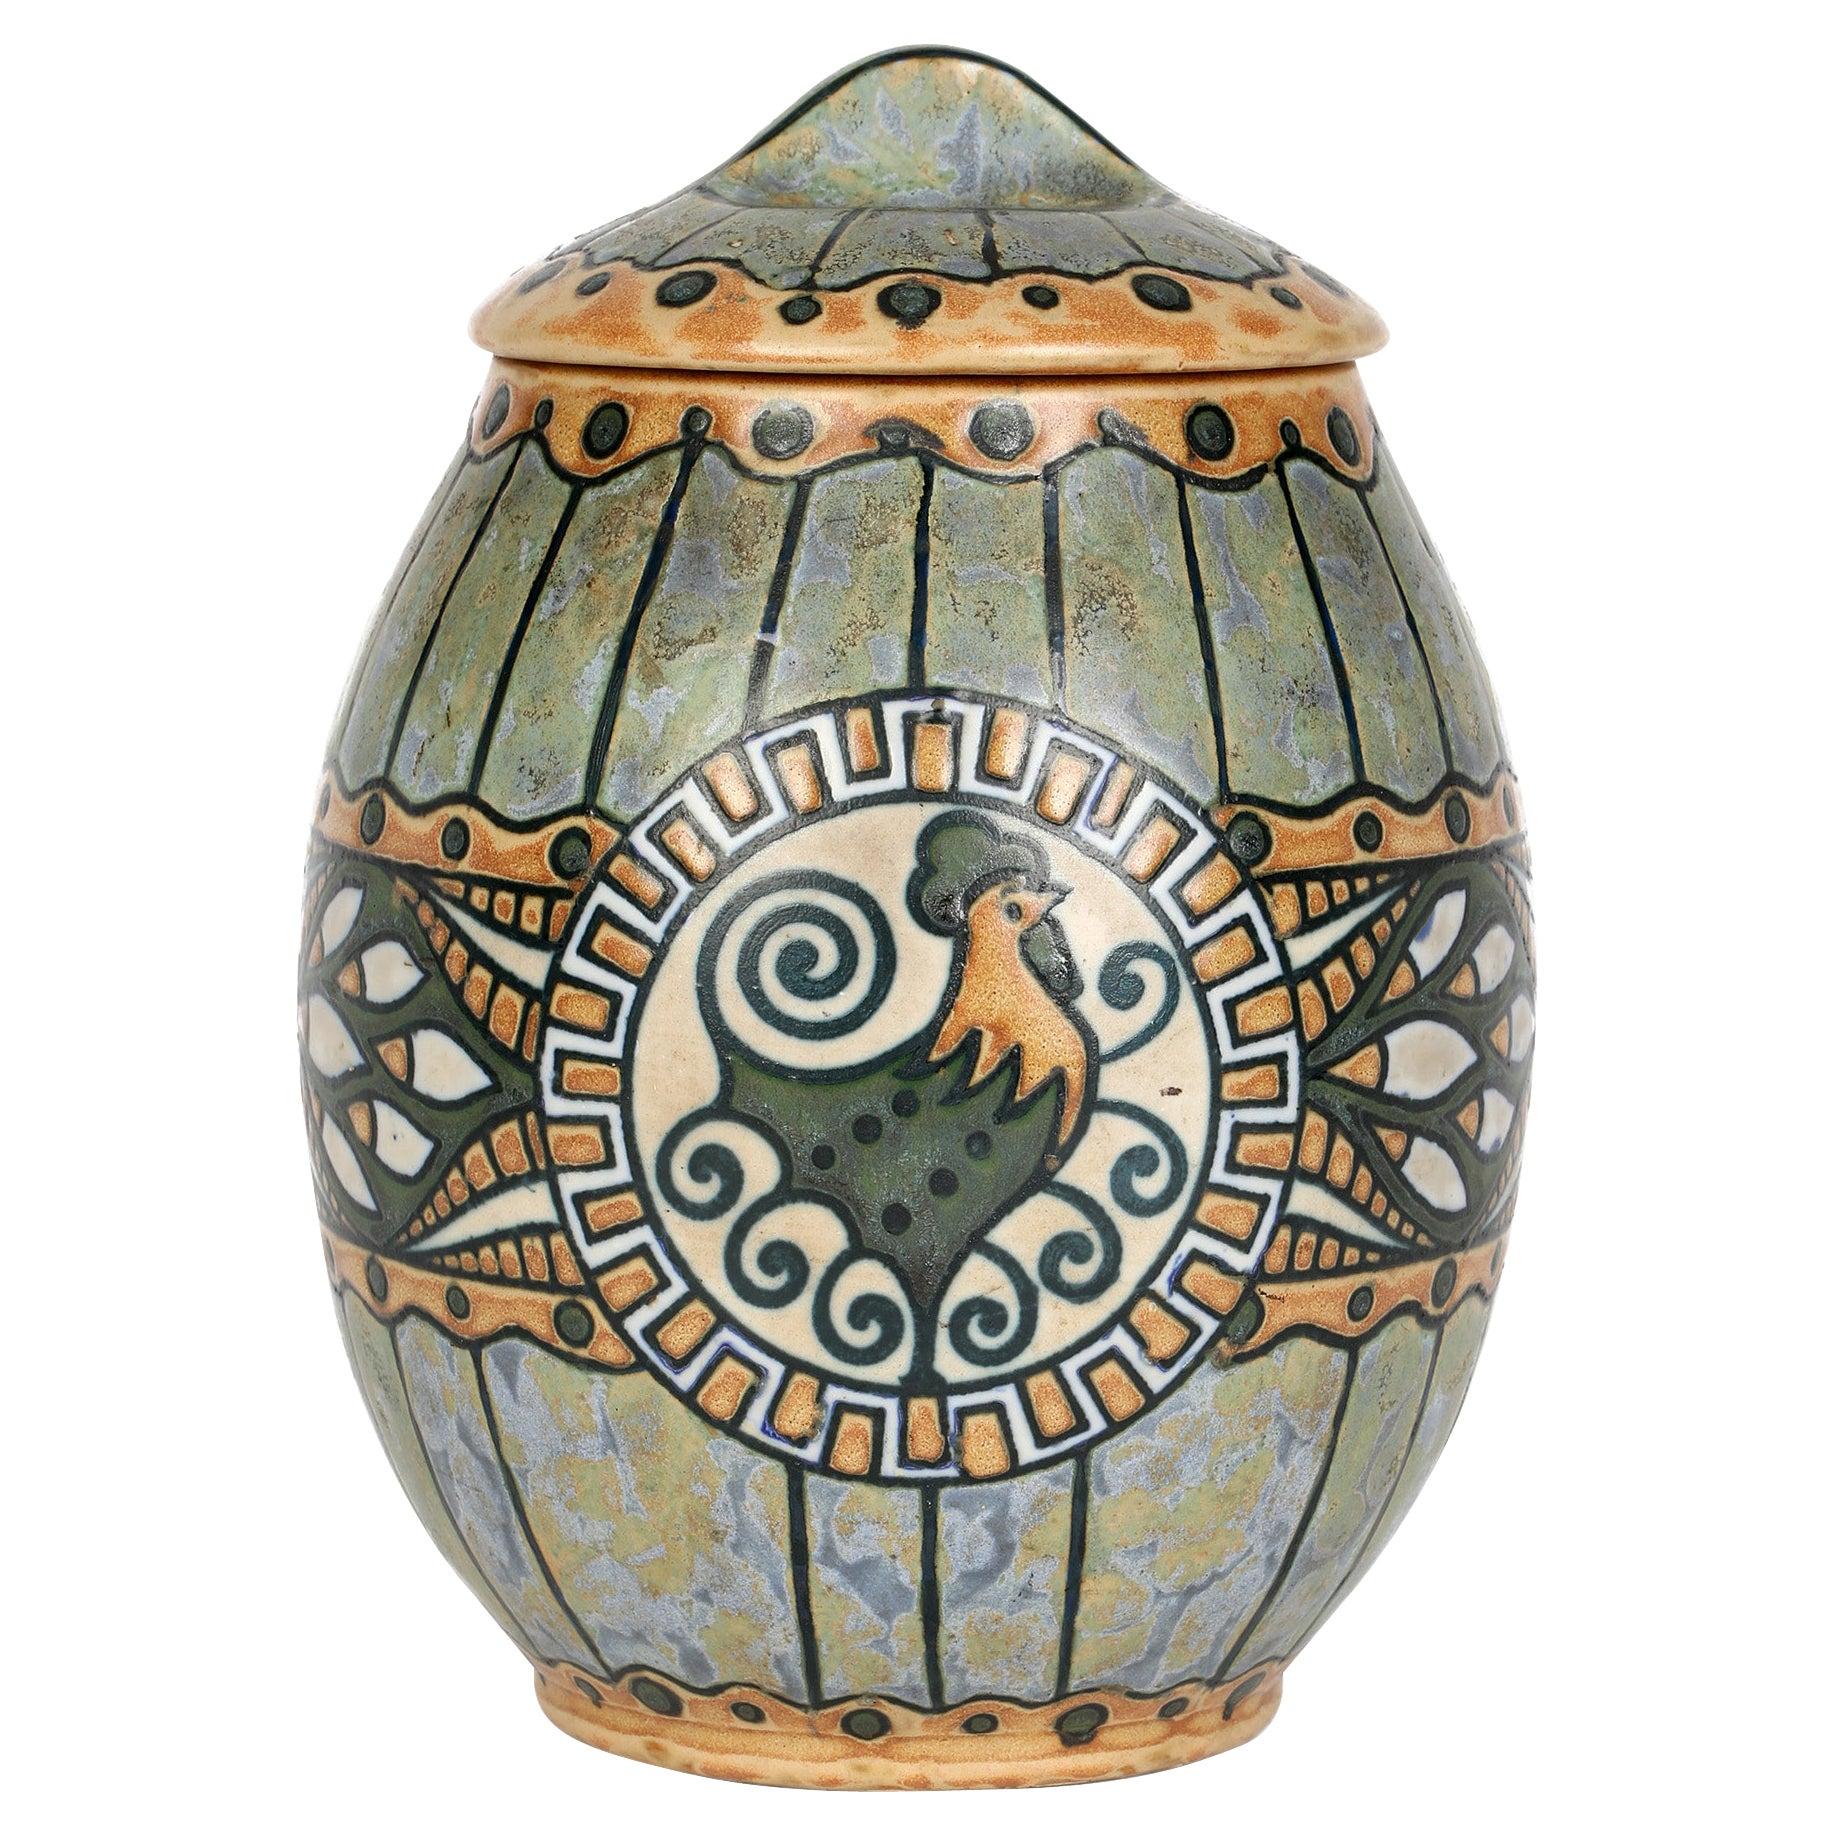 Charles Catteau Boch Freres Keramis Art Deco Pottery Lidded Cockerel Jar